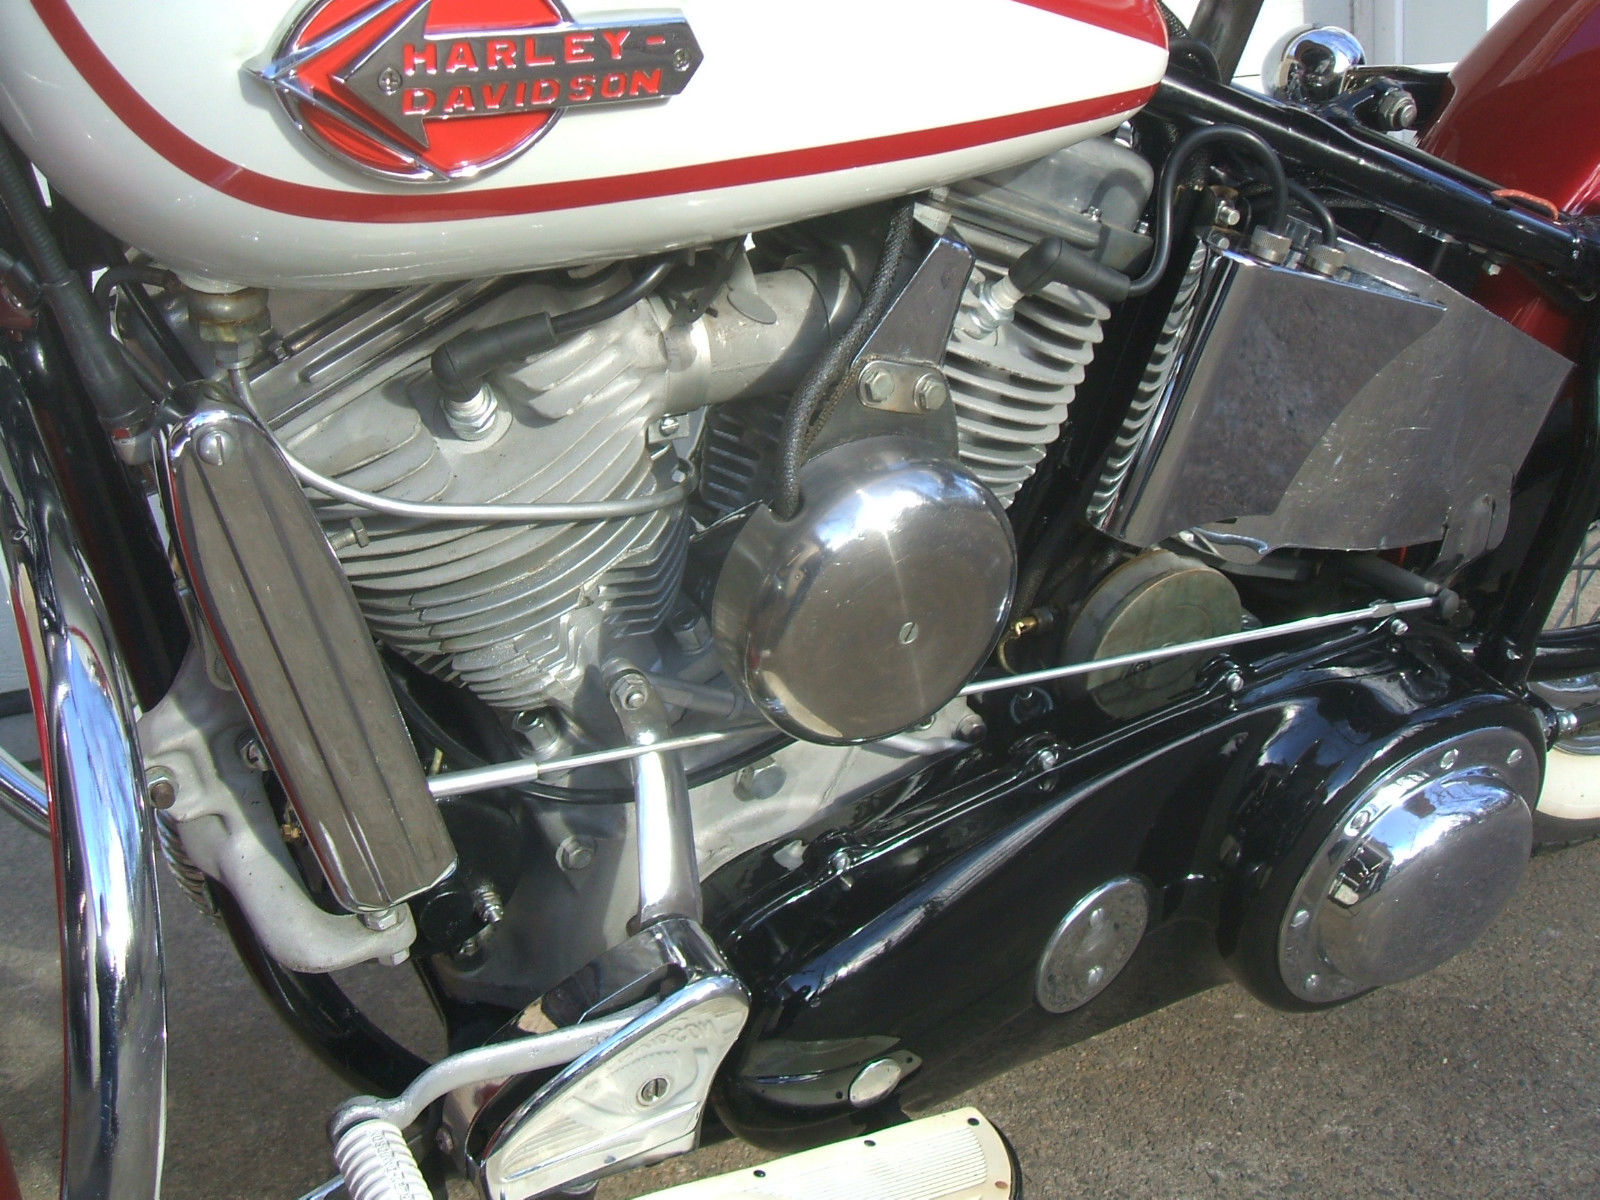 Harley-Davidson Panhead - 1960 - Gear Linkage, Horn, Motor, Heads and Transmission.